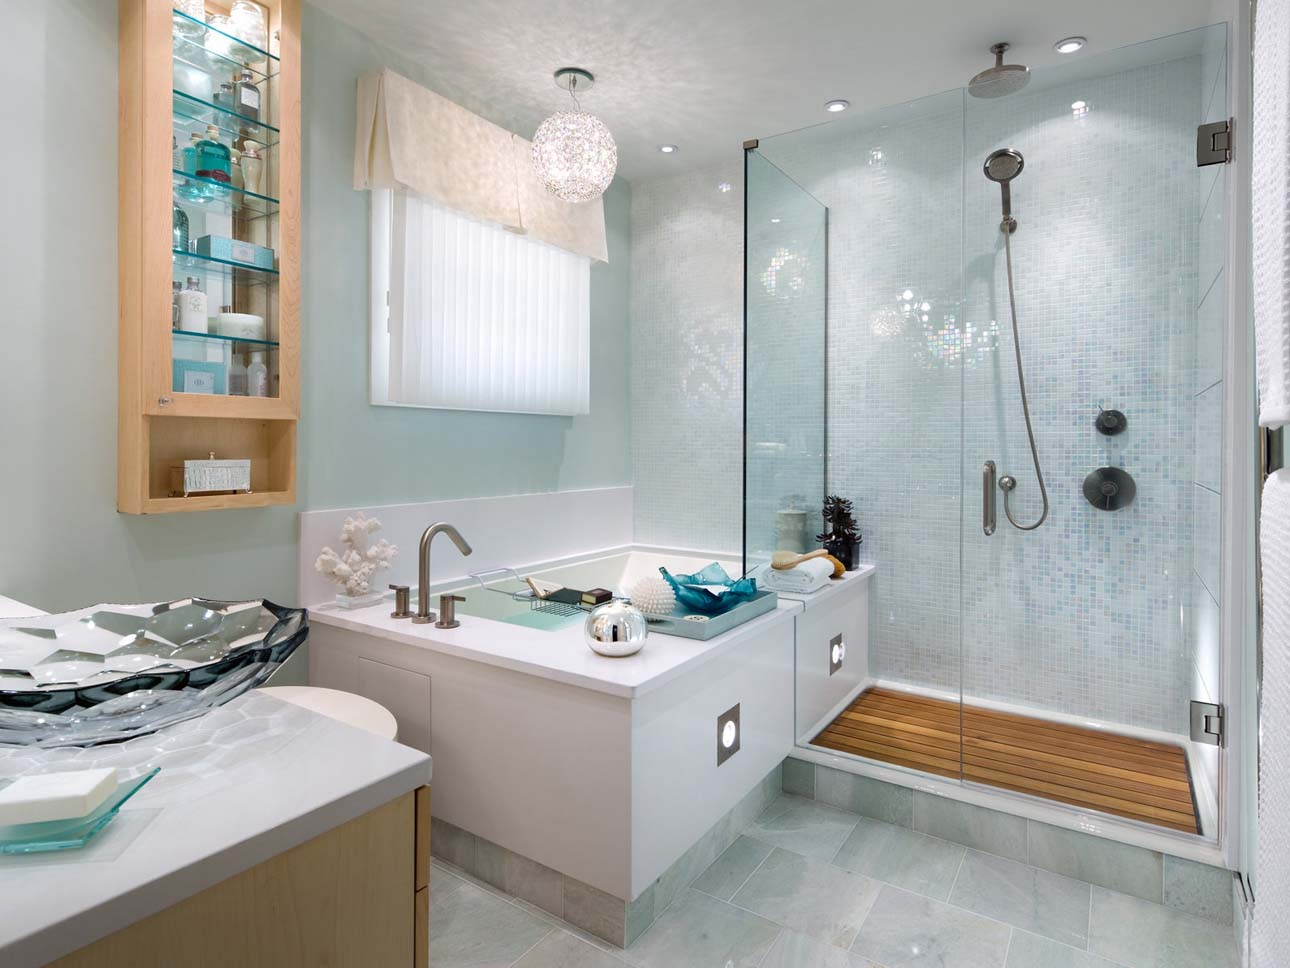 Bathroom Wallpaper Widescreen HD 64836 11016 Wallpaper Cool 1290x968